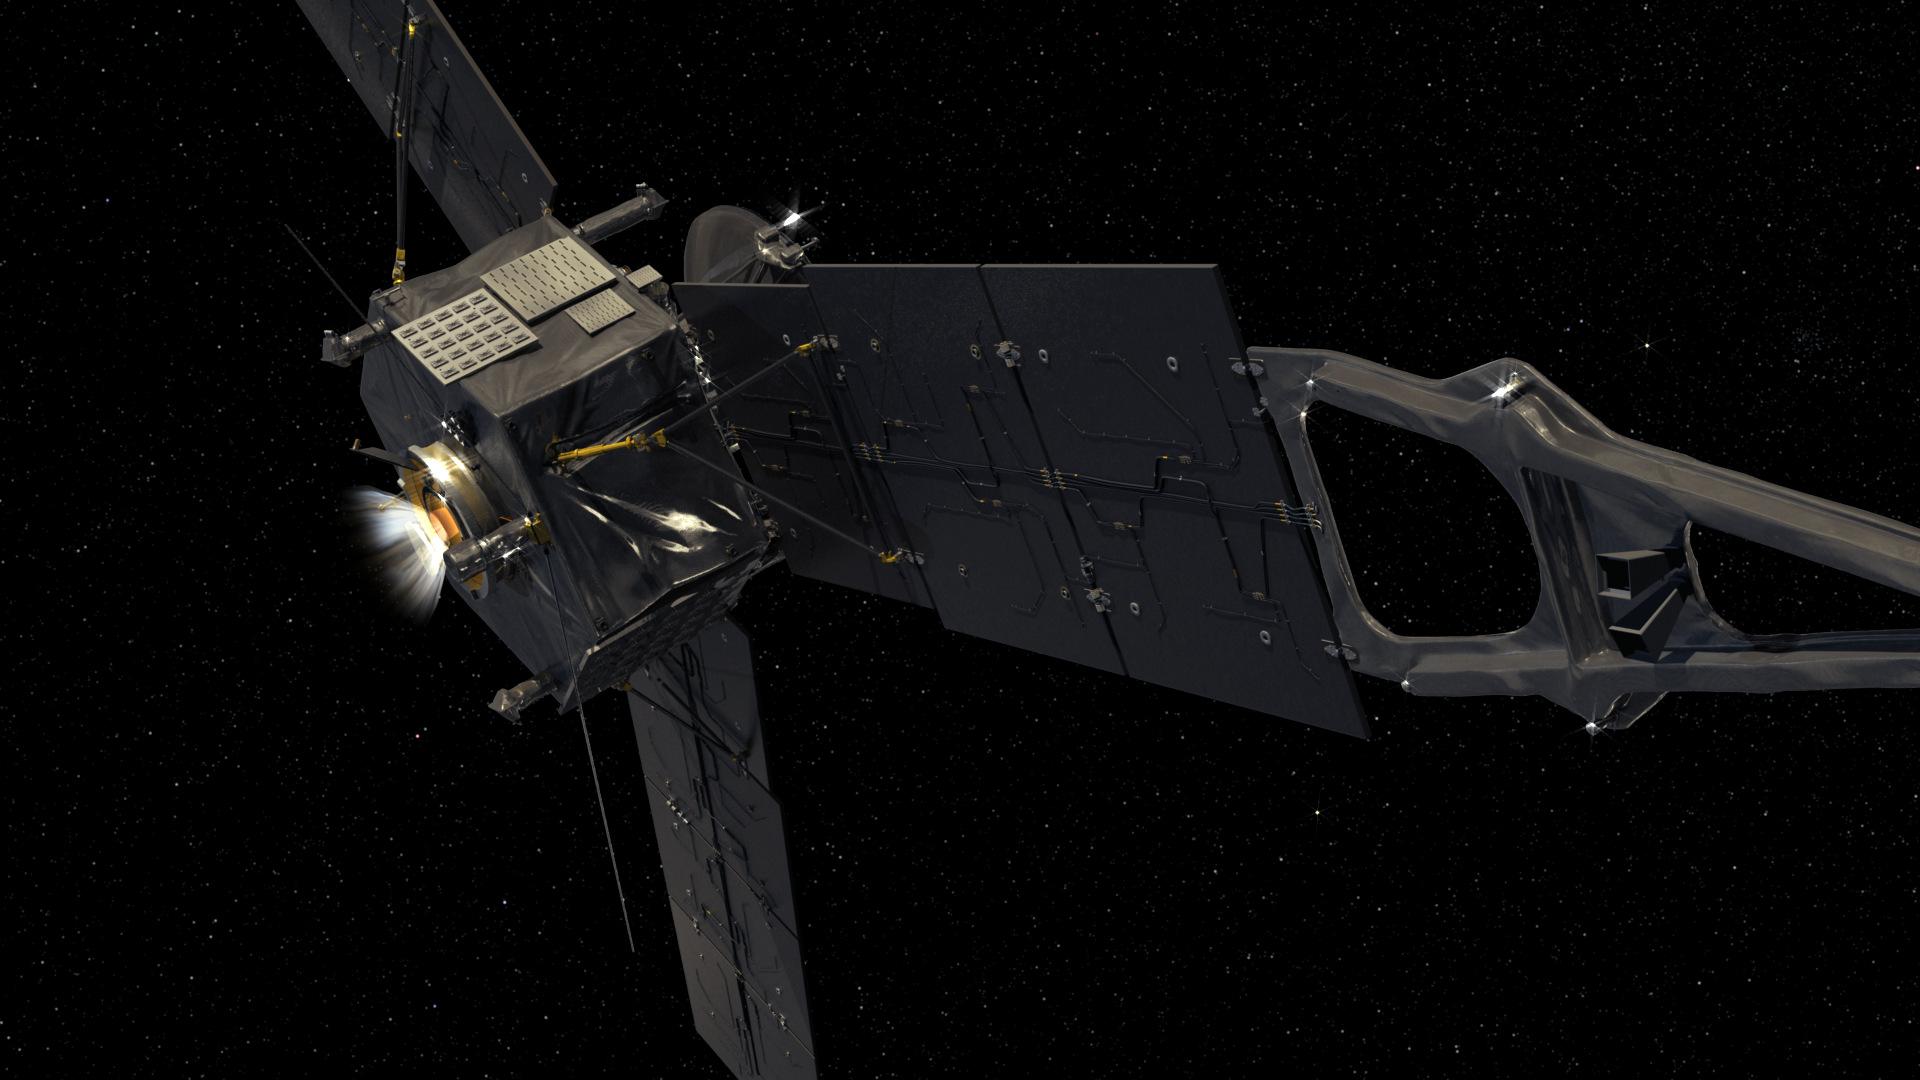 juno space mission - photo #12